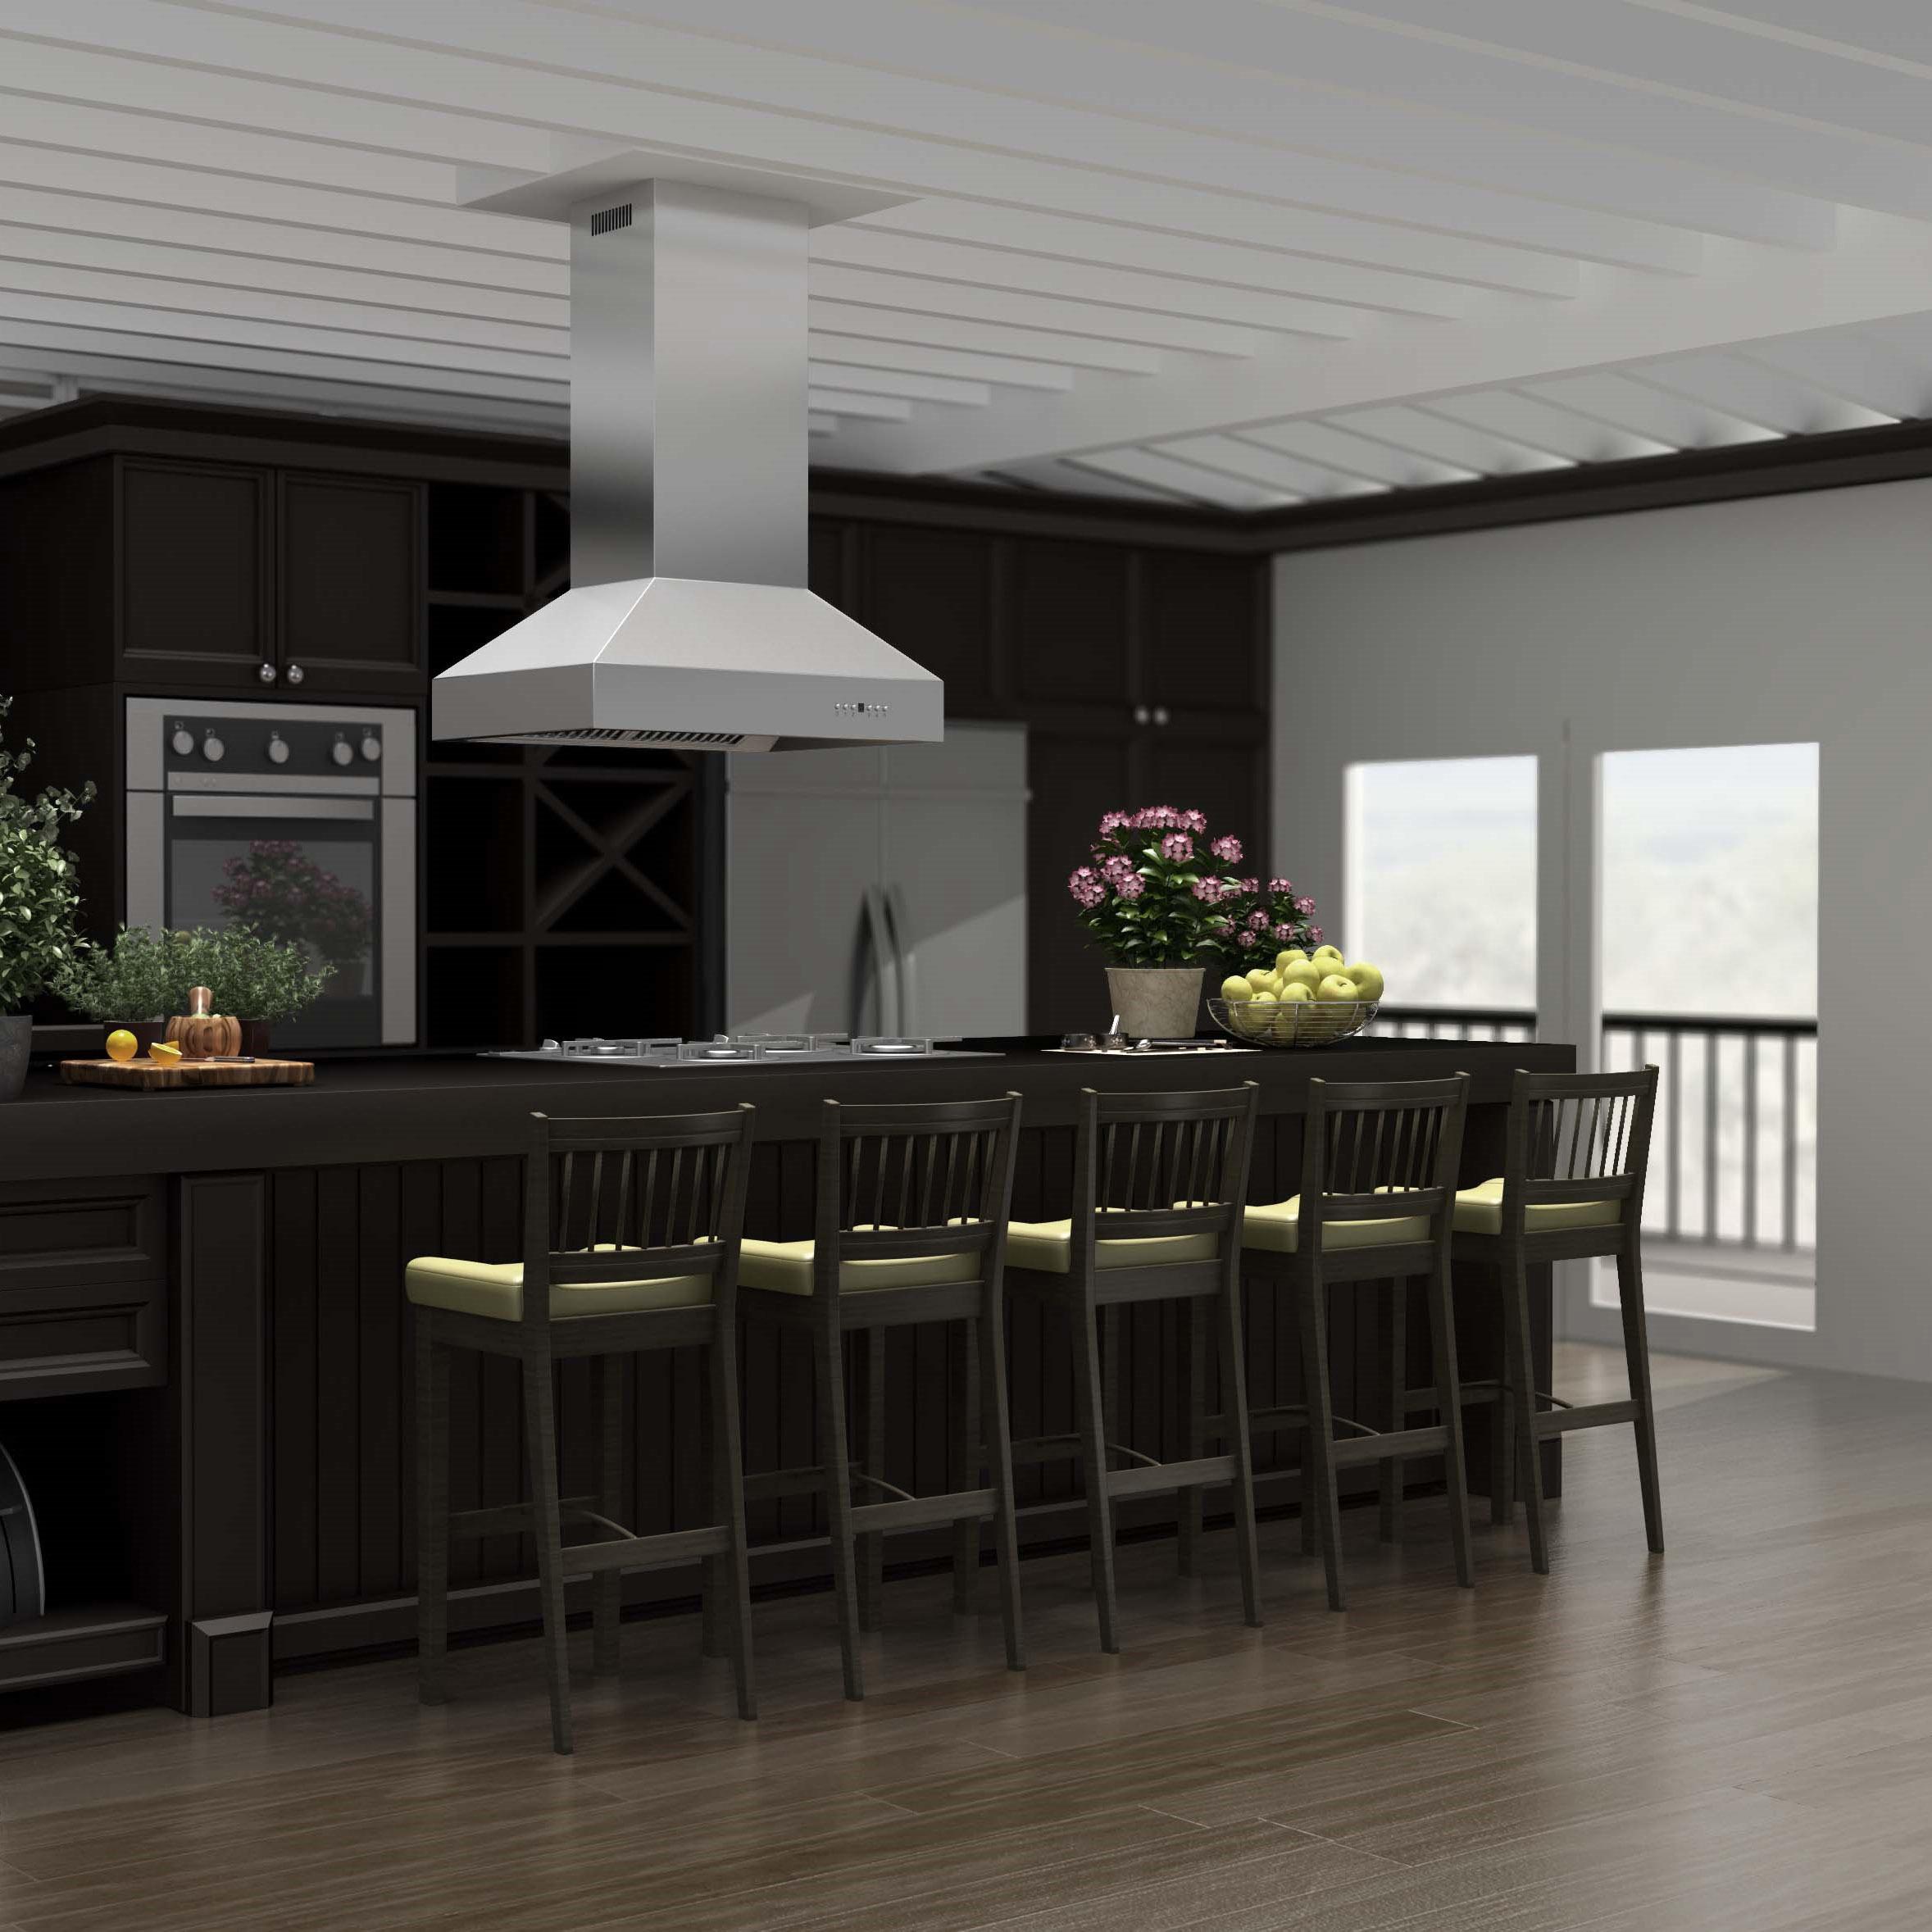 zline-stainless-steel-island-range-hood-697i-kitchen-far.jpg